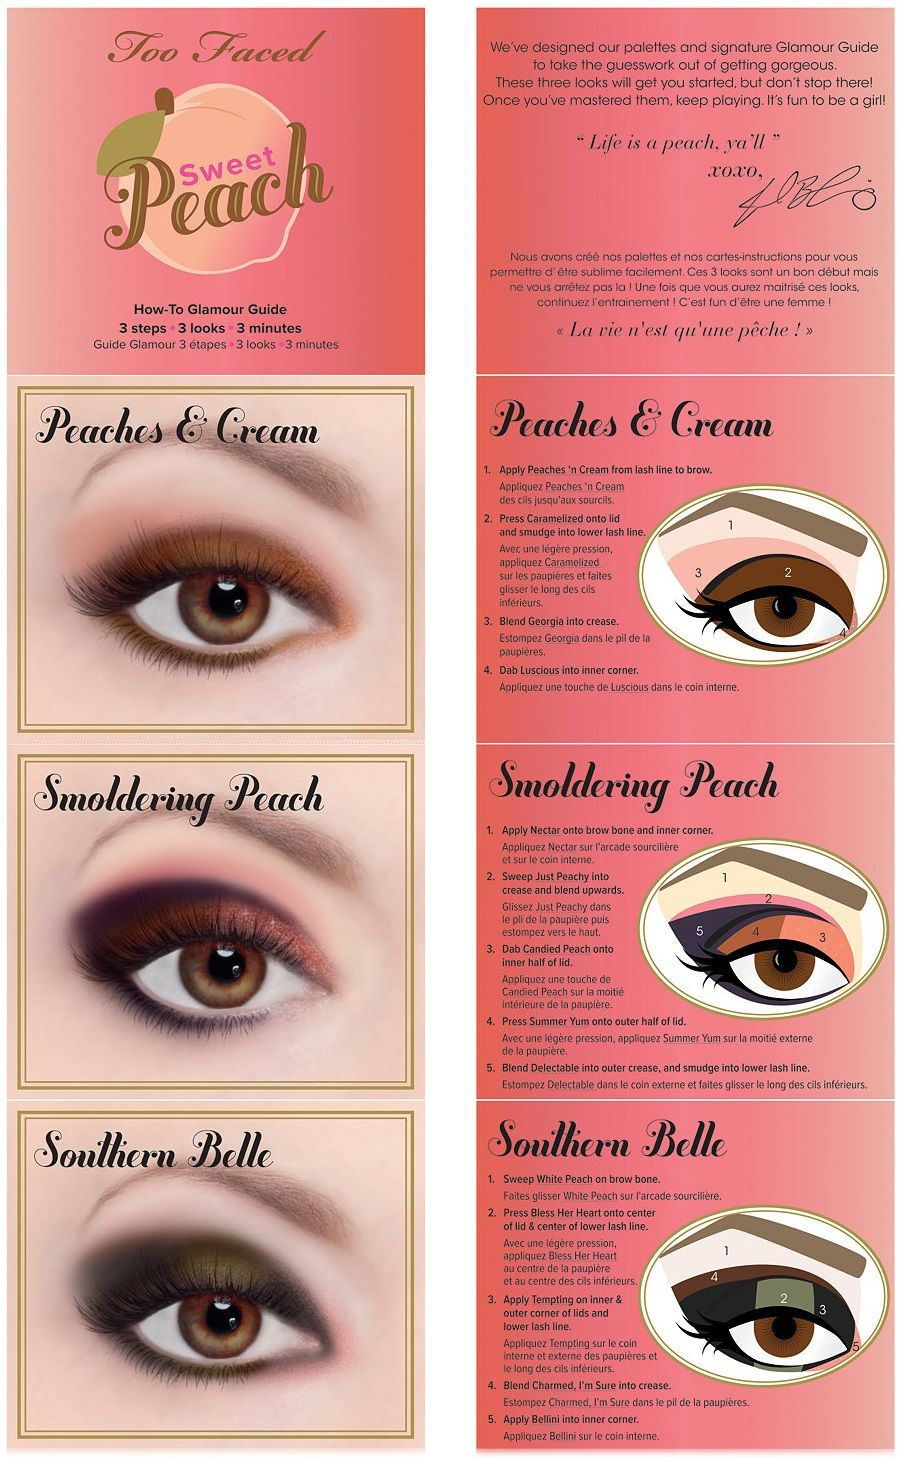 Примеры макияжей палеткой теней Sweet Peach от Too Faced